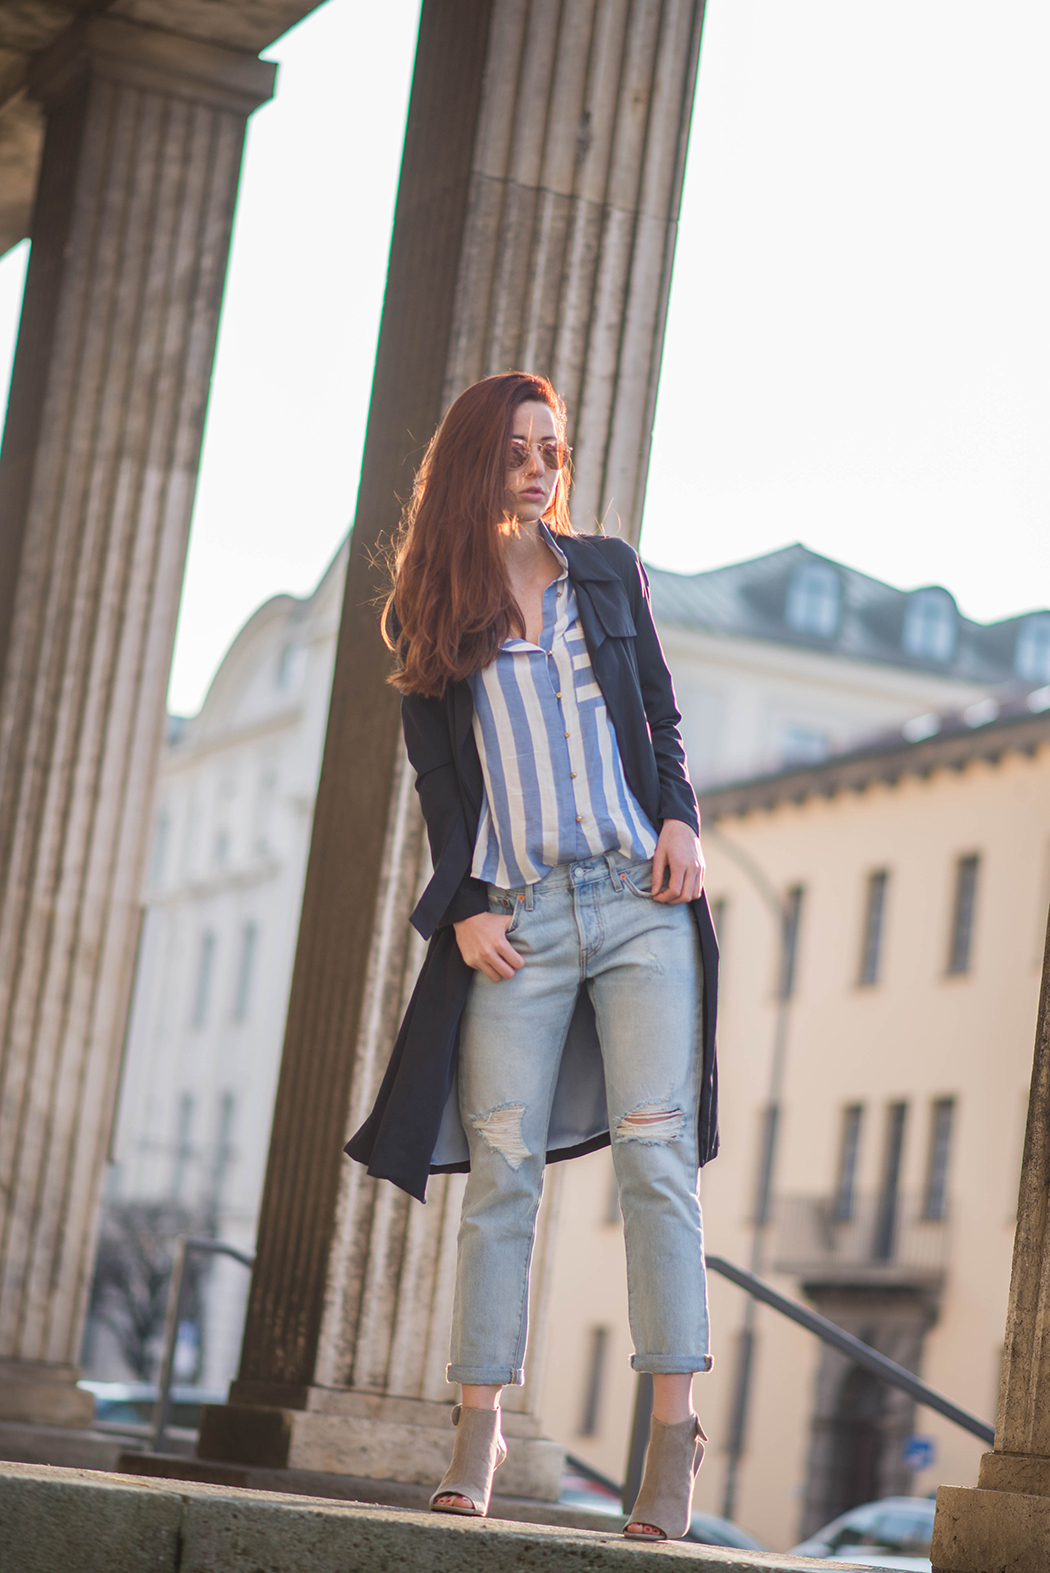 Fashionblogger-Deutschland-Fashionblog-München-Lindarella-Levis-501CT-Marinelook-Ripped-Jeans-Lindarella-3